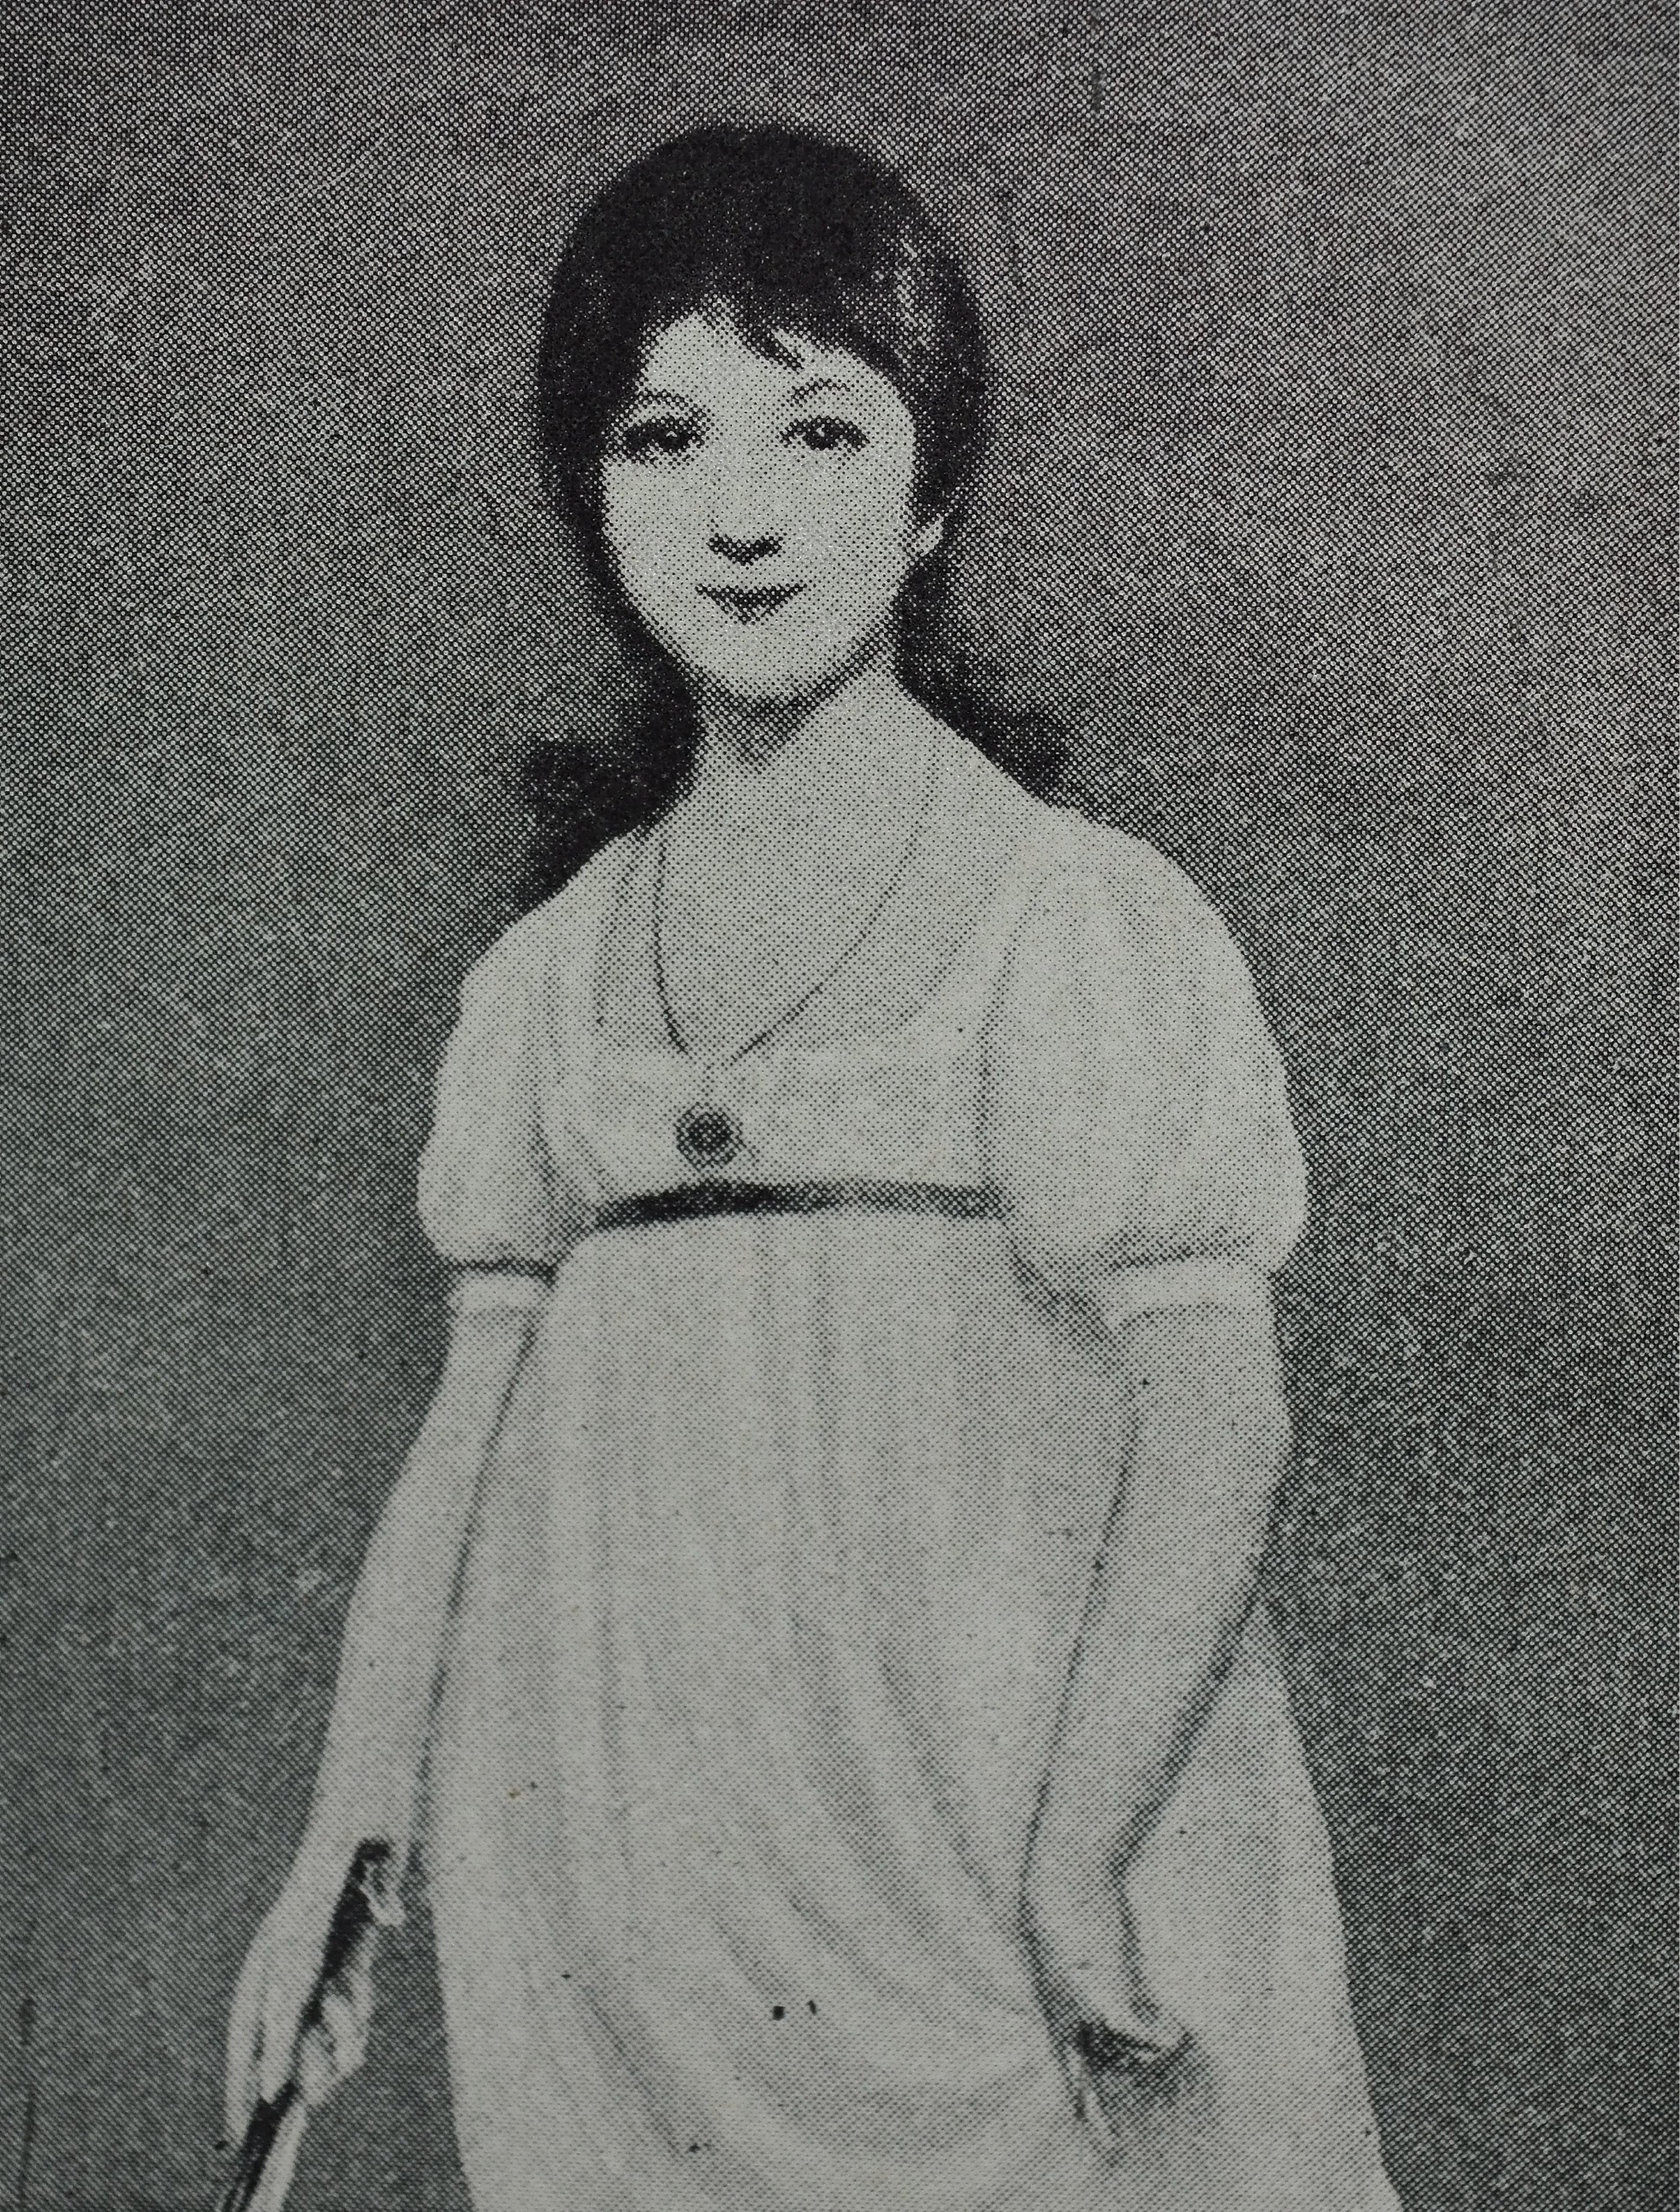 Jane Austen Loved Guilty Pleasure Reads, Just Like We